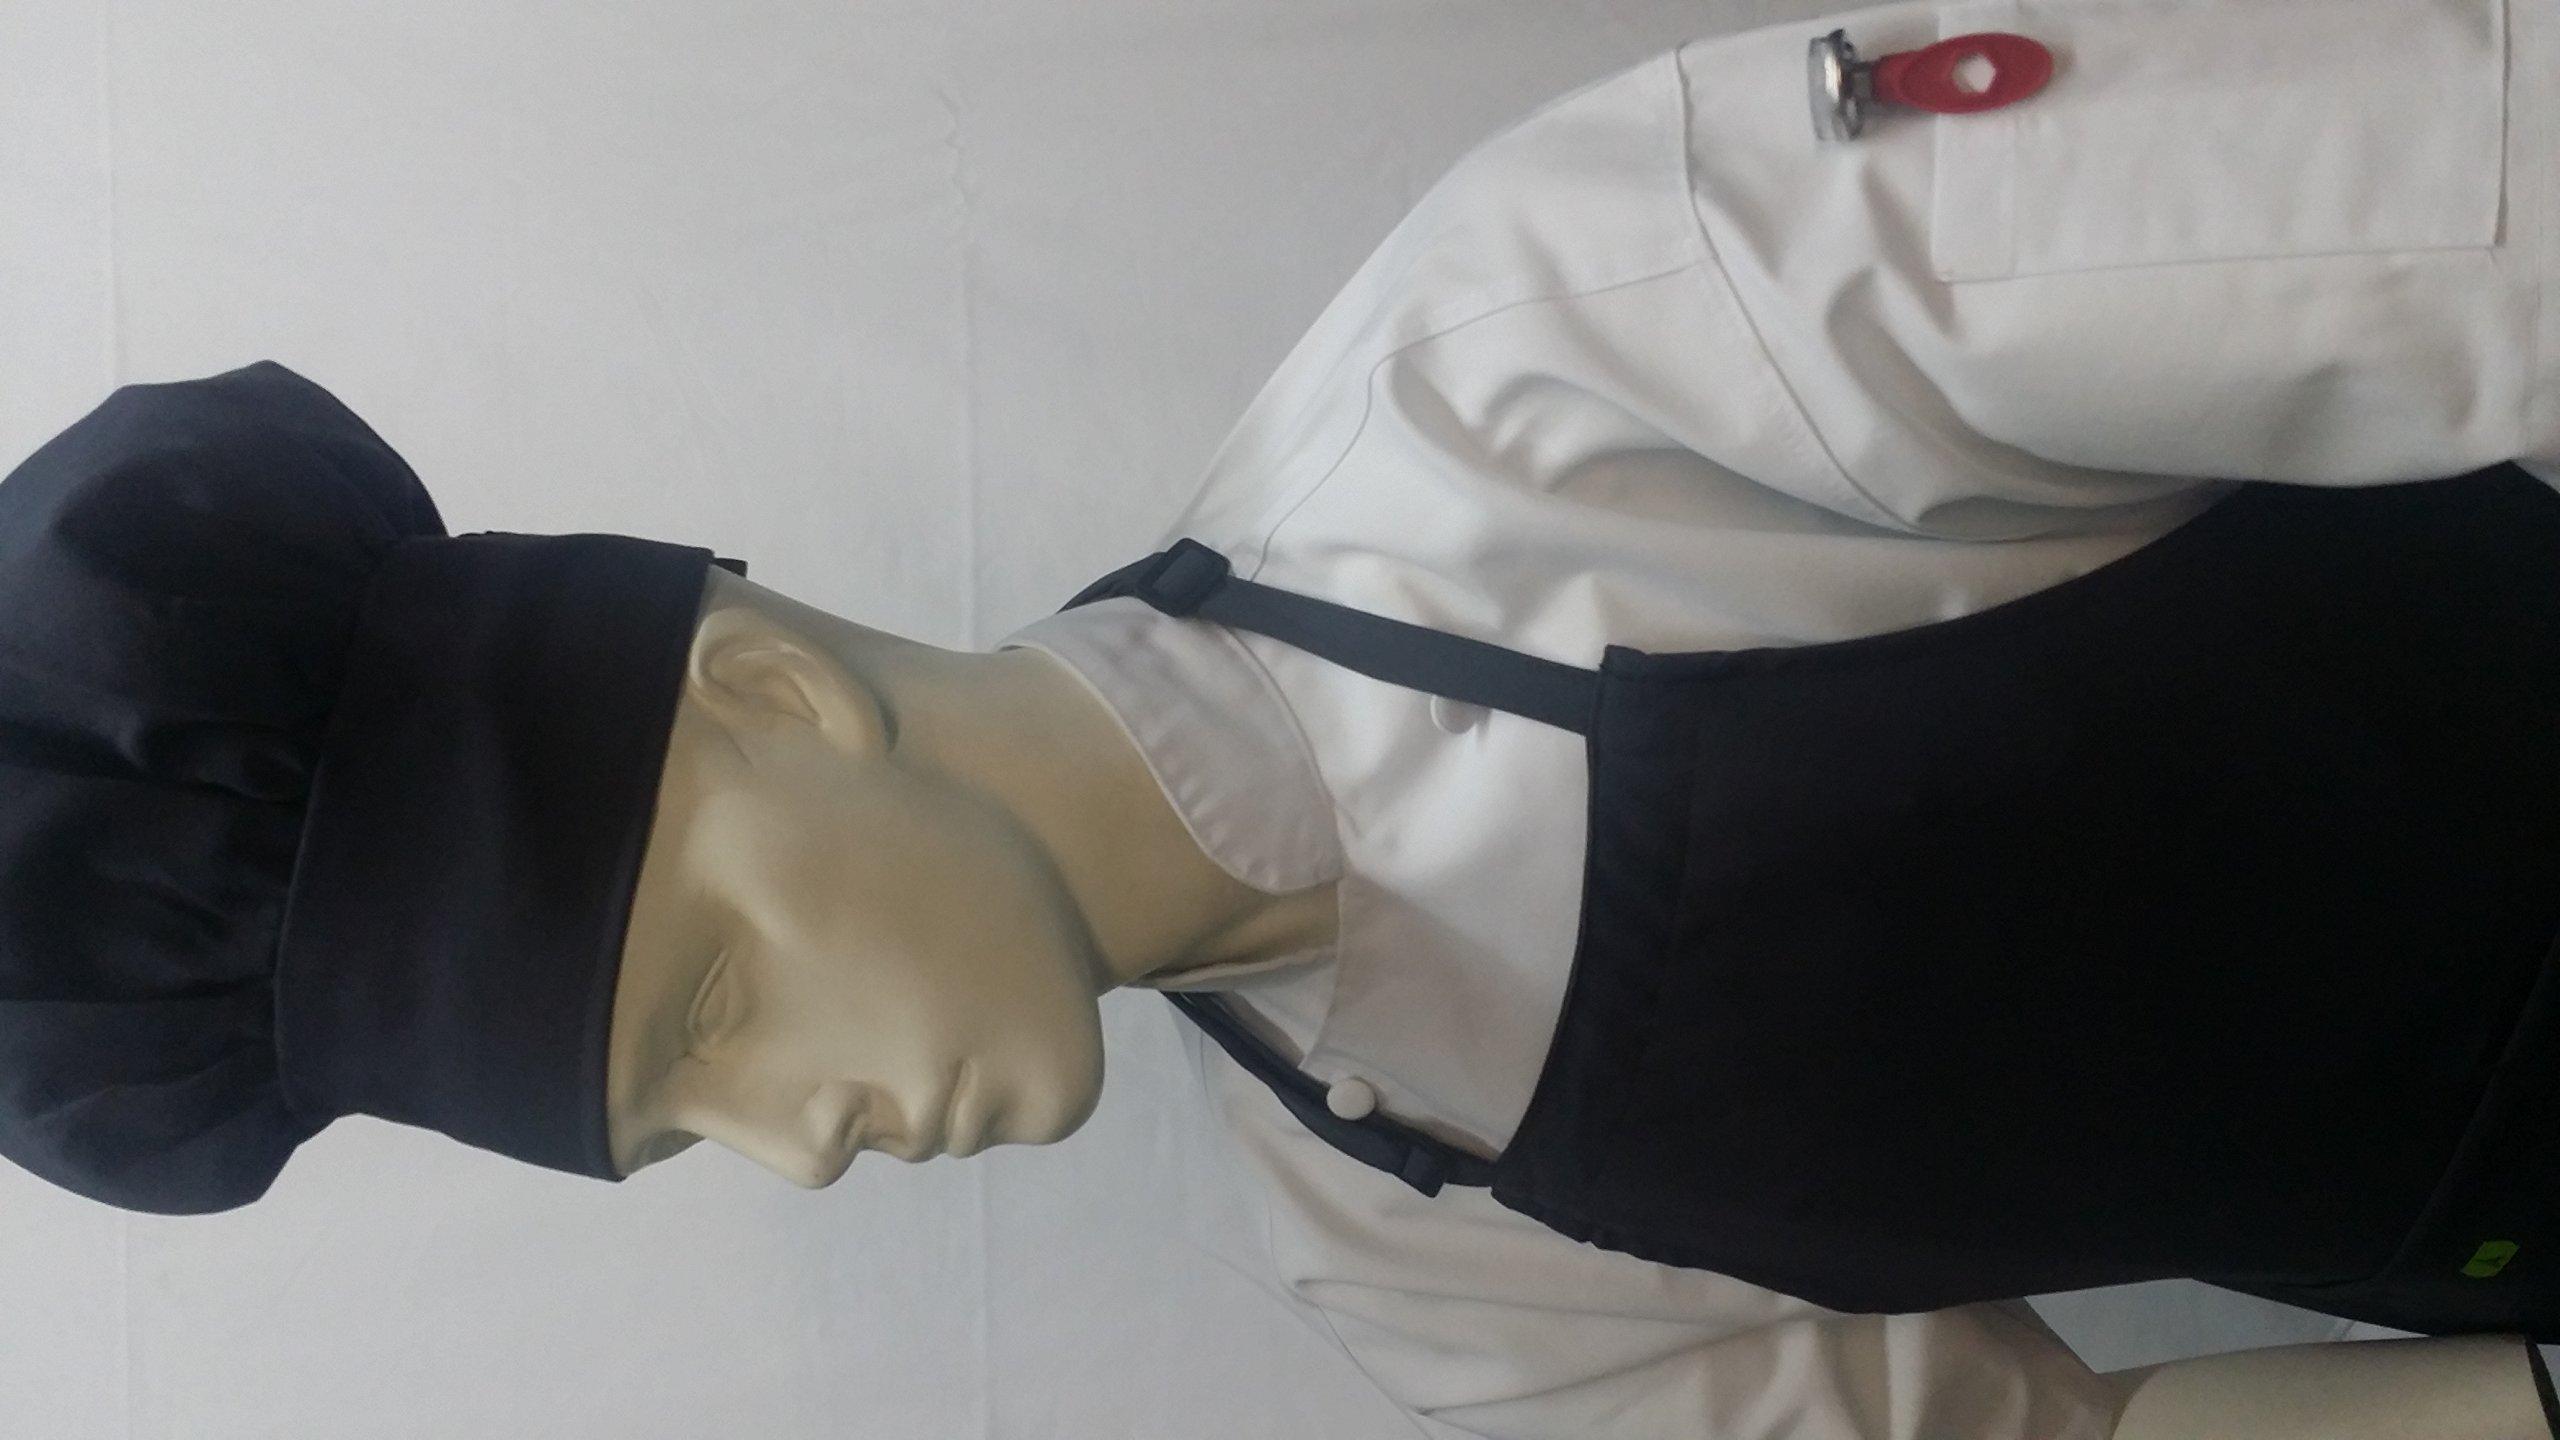 Chefskin Light Grey 2X XXL Chef Set (Apron+hat) Adjustable, Ultra Lite Fabric